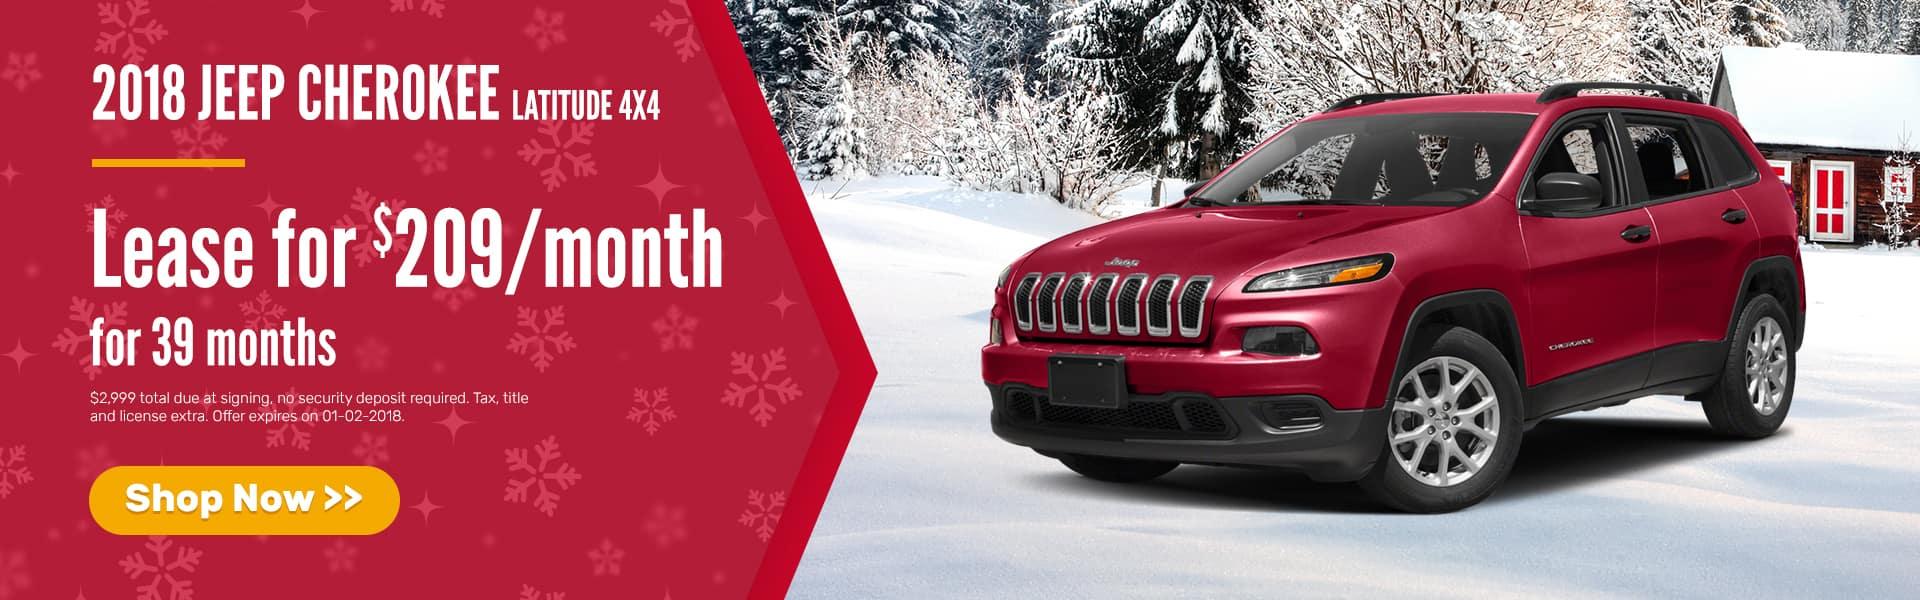 Jeep Cherokee December Offer Mancari's